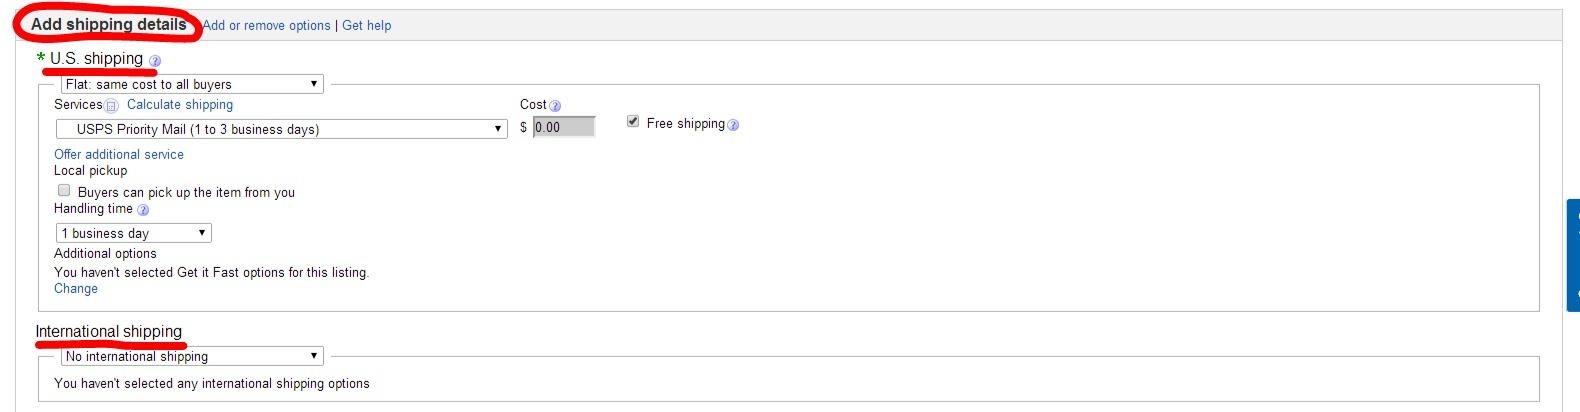 eBay International Shipping in 3 Easy Steps | Cheapest Way